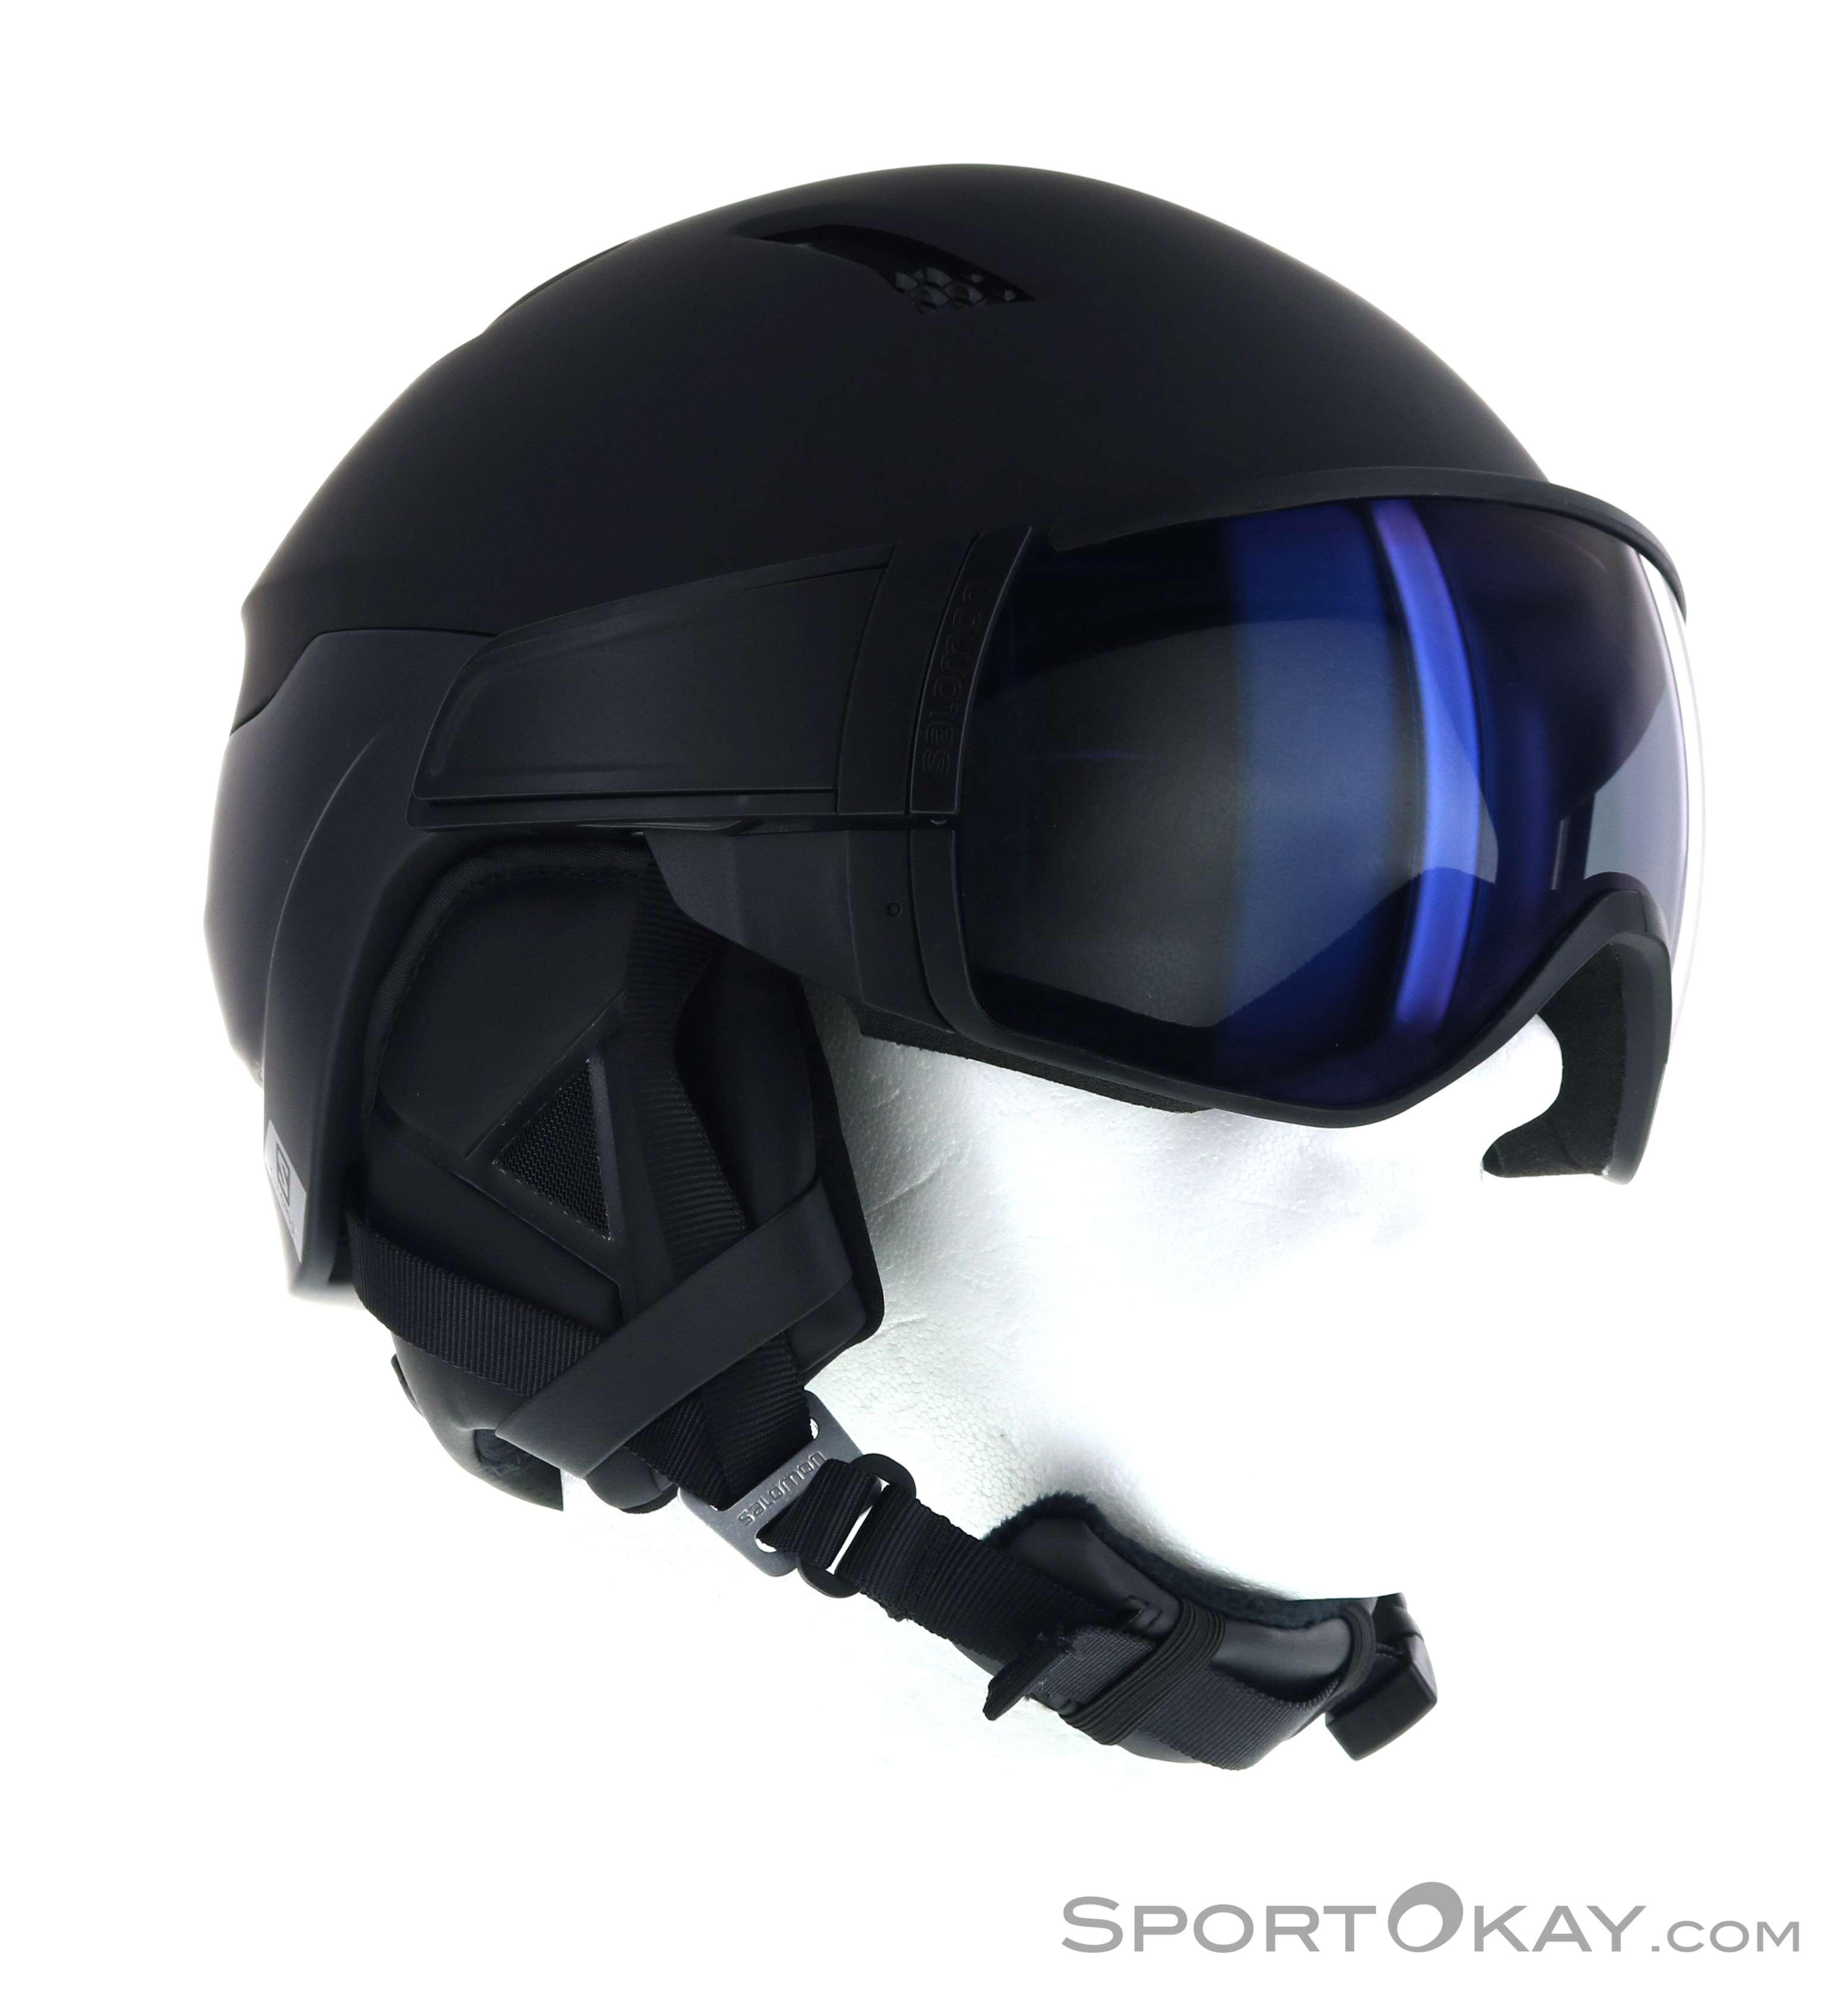 Salomon Driver S Ski Helmet Ski Helmets Ski Helmets ZfMQP